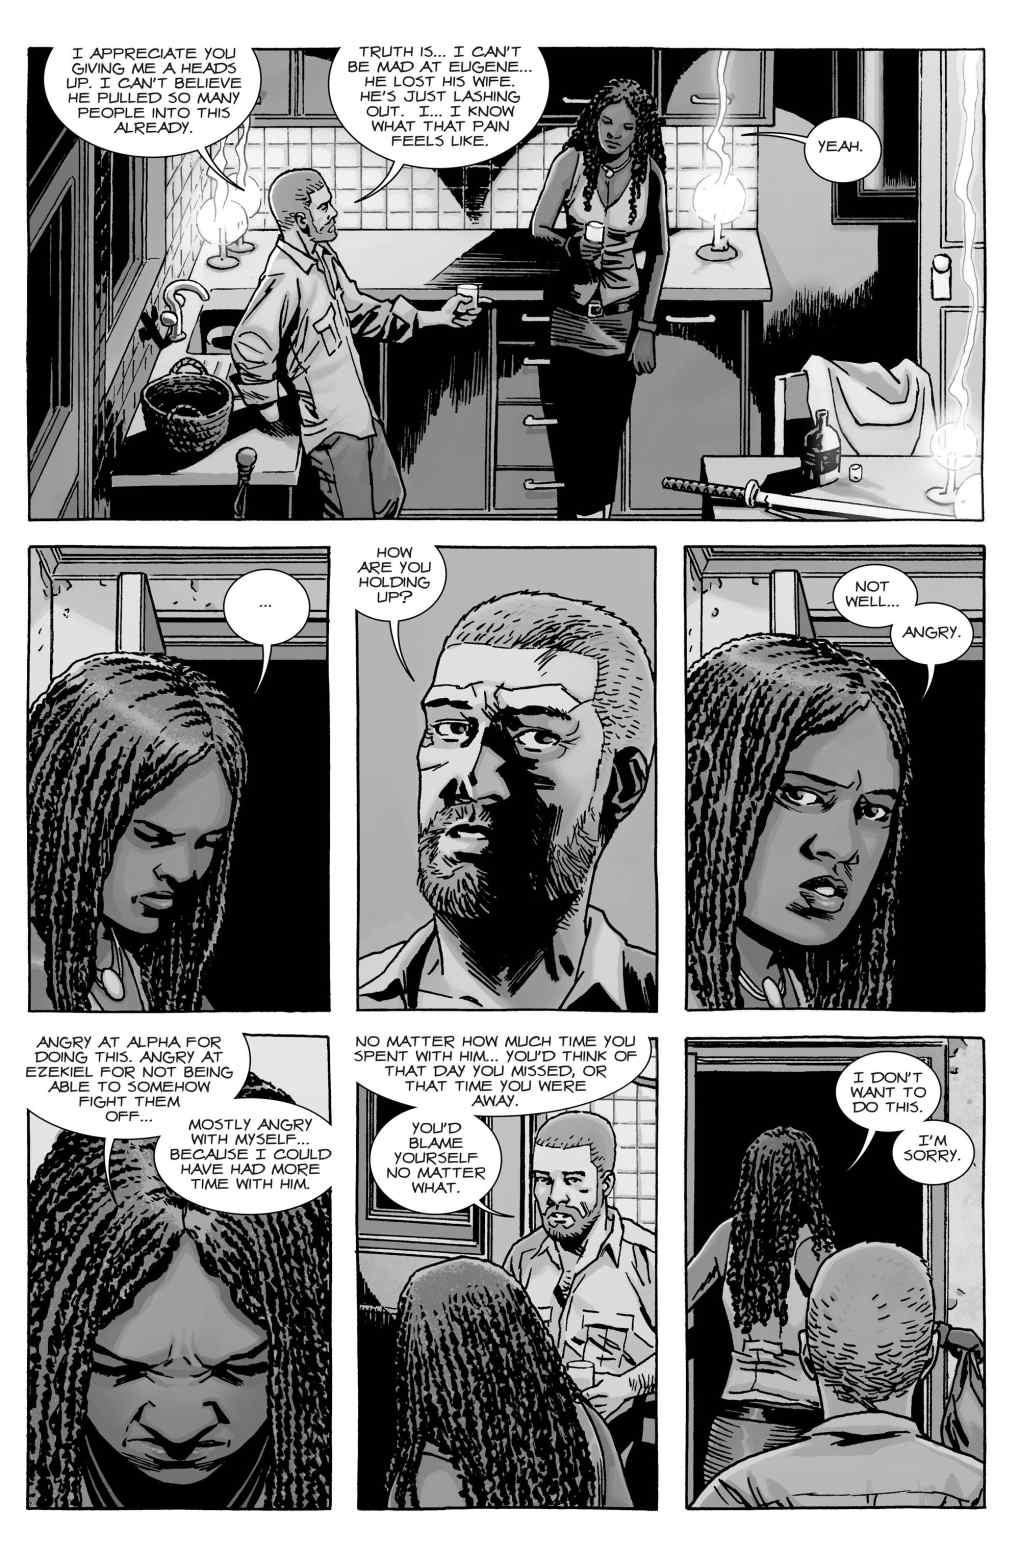 Read Comics Online Free - The Walking Dead - Chapter 147